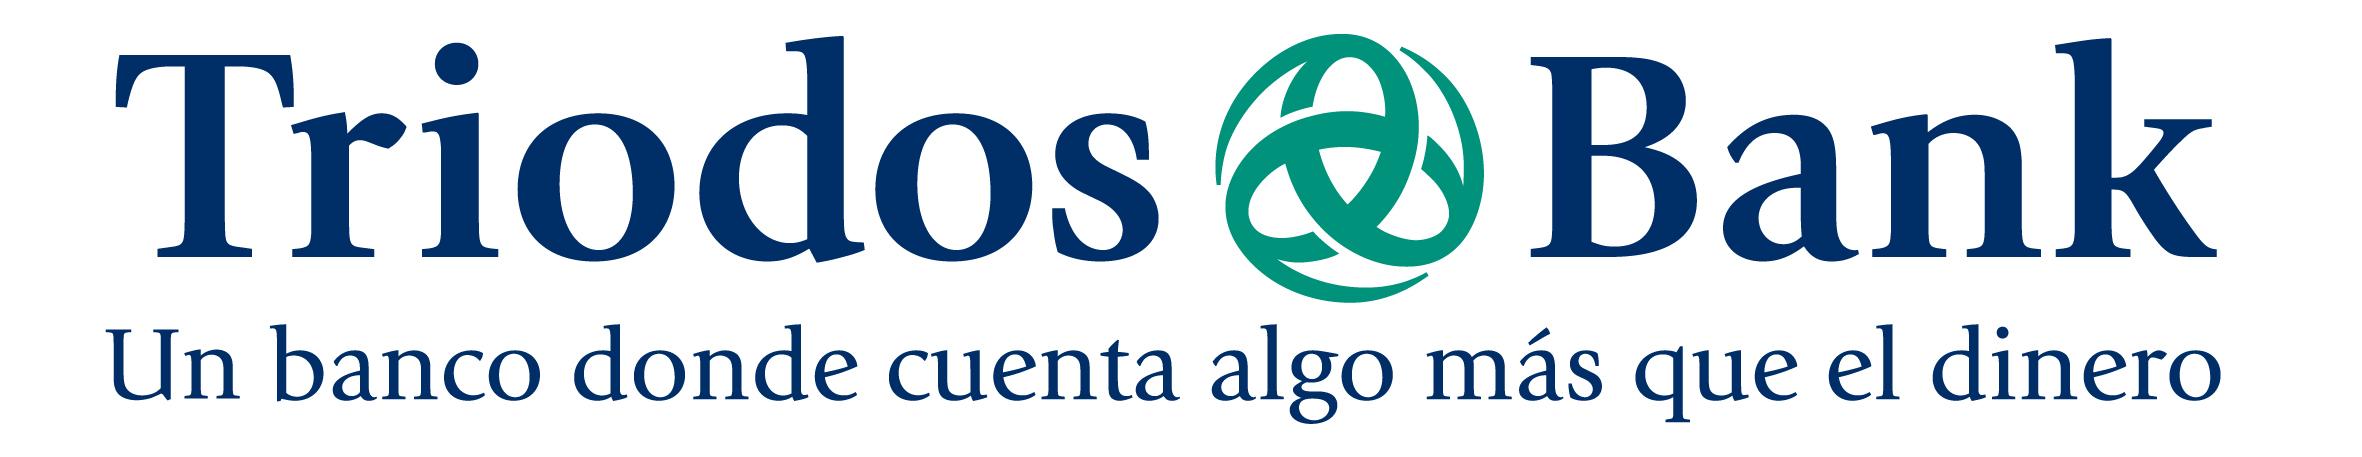 Filelogo Triodos Bank Jpg